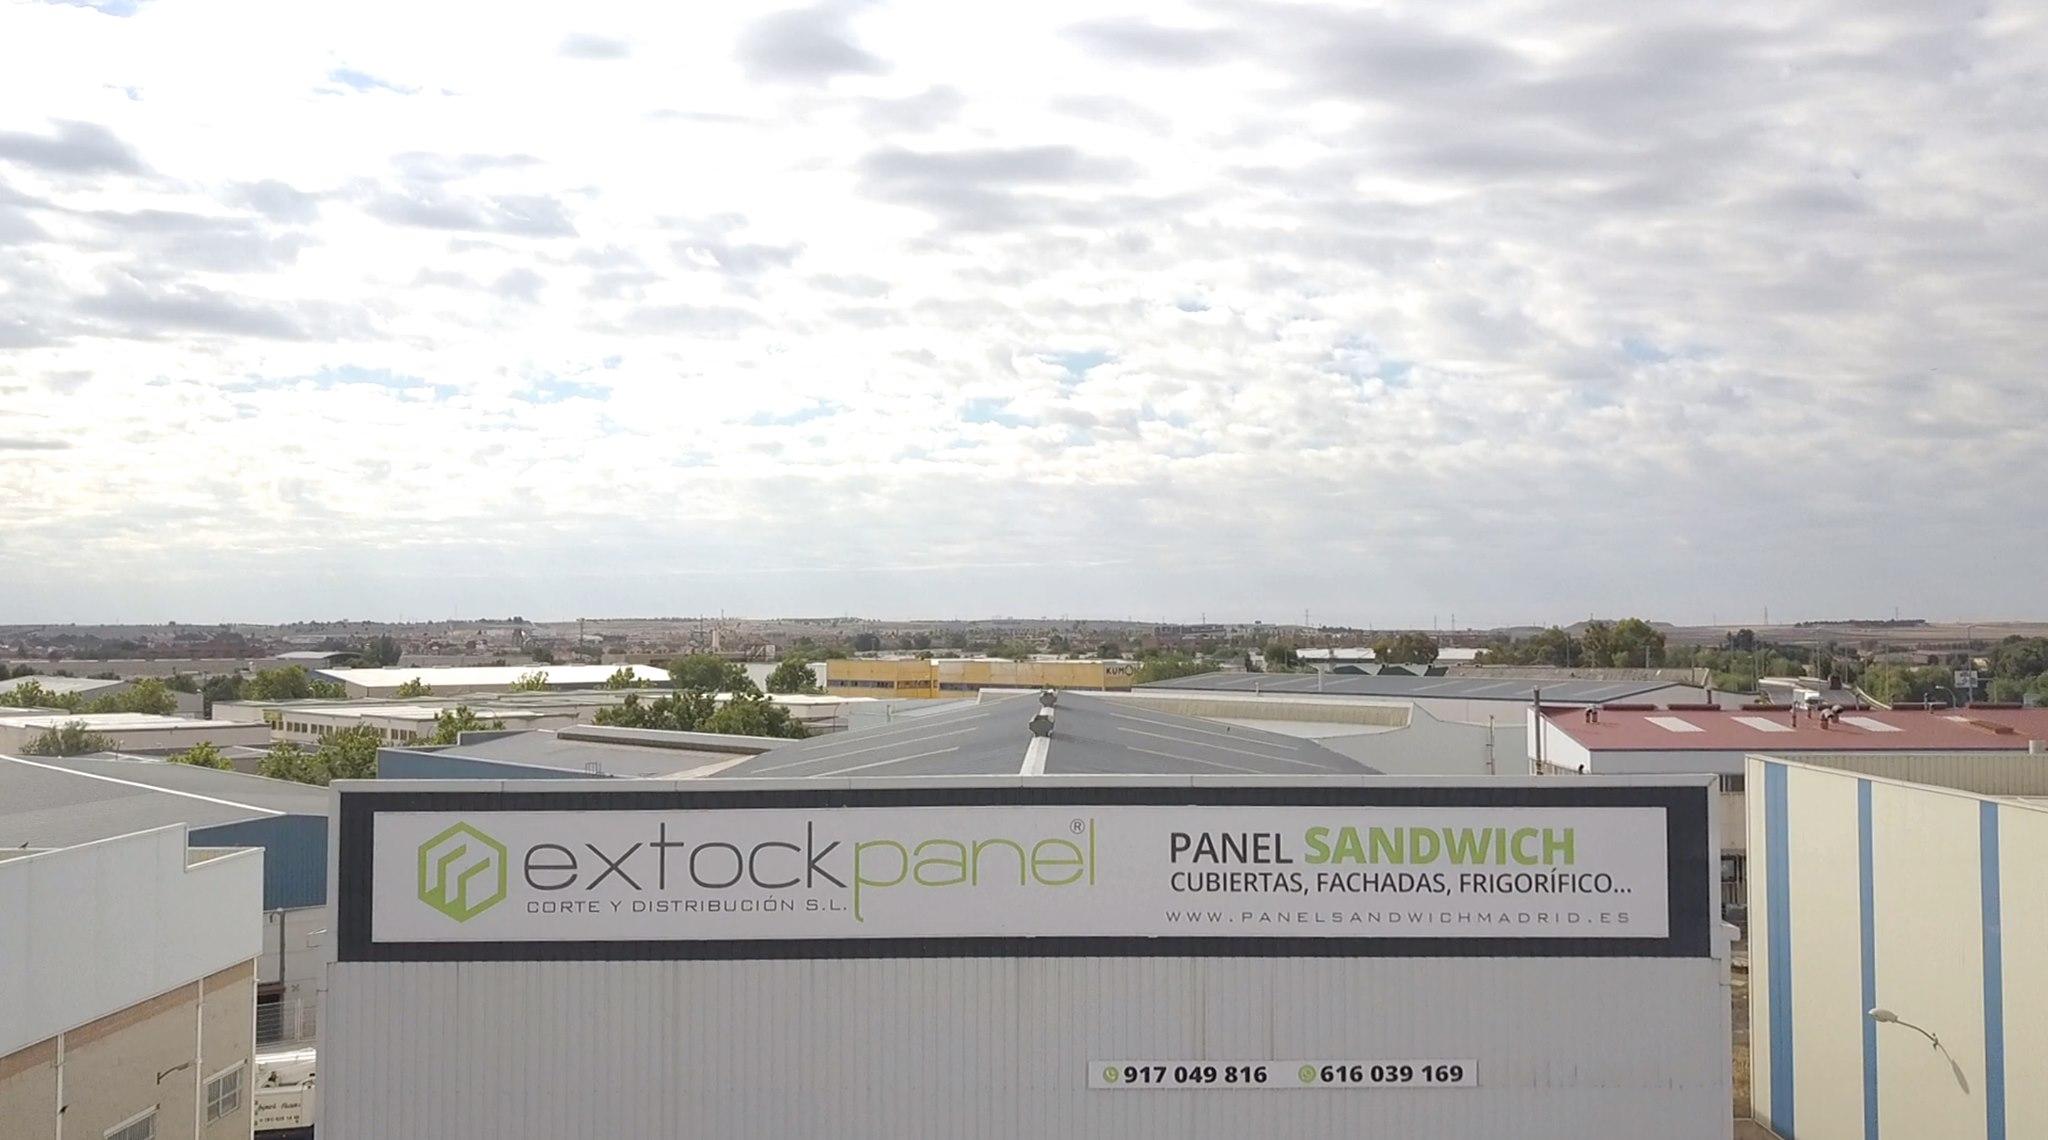 Vista aérea de la nave de Extockpanel